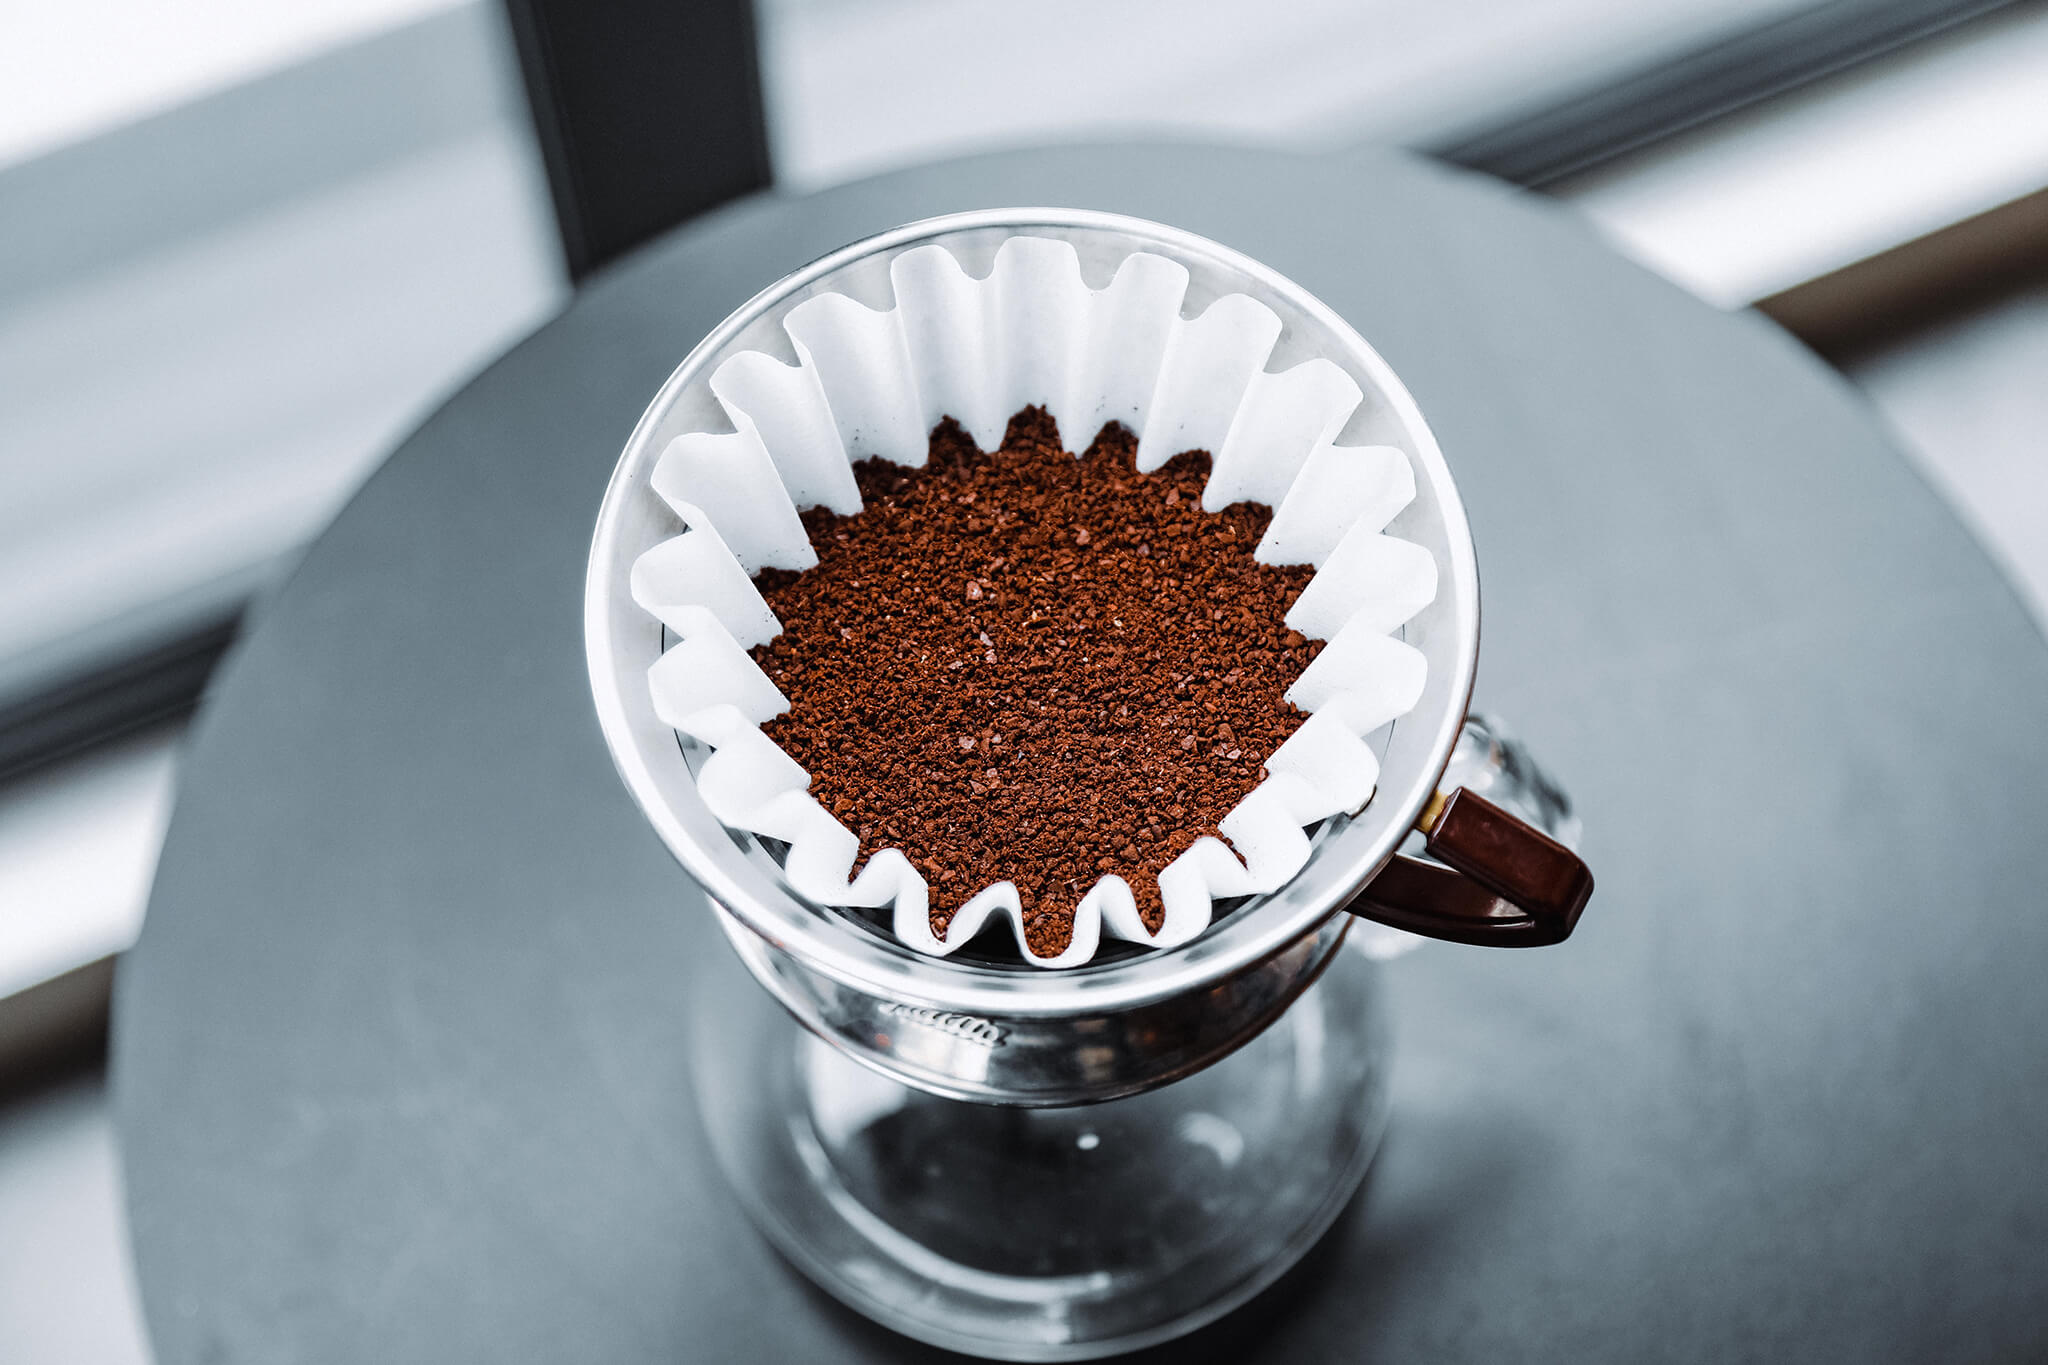 A Kalita coffee bundle on a table